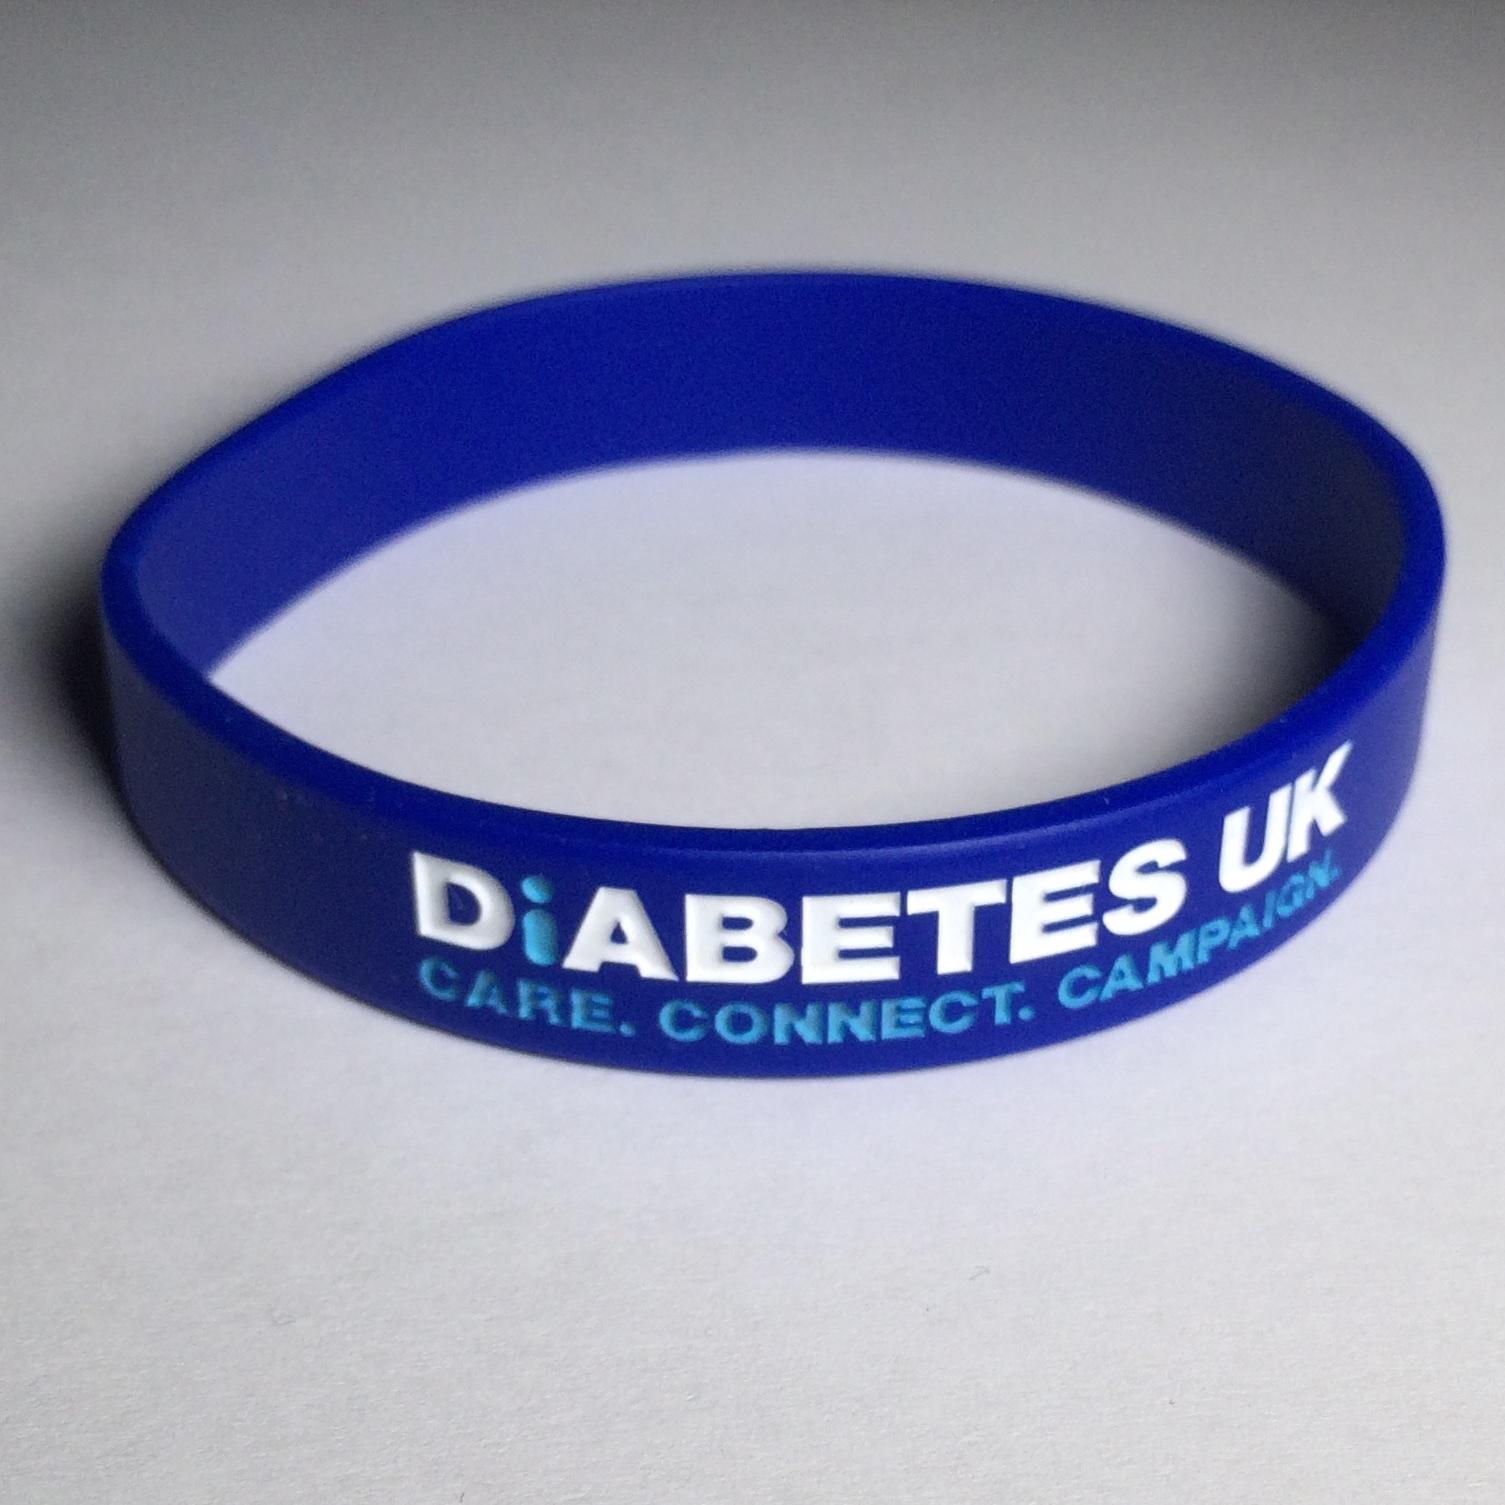 Diabetes UK supporter wristband.